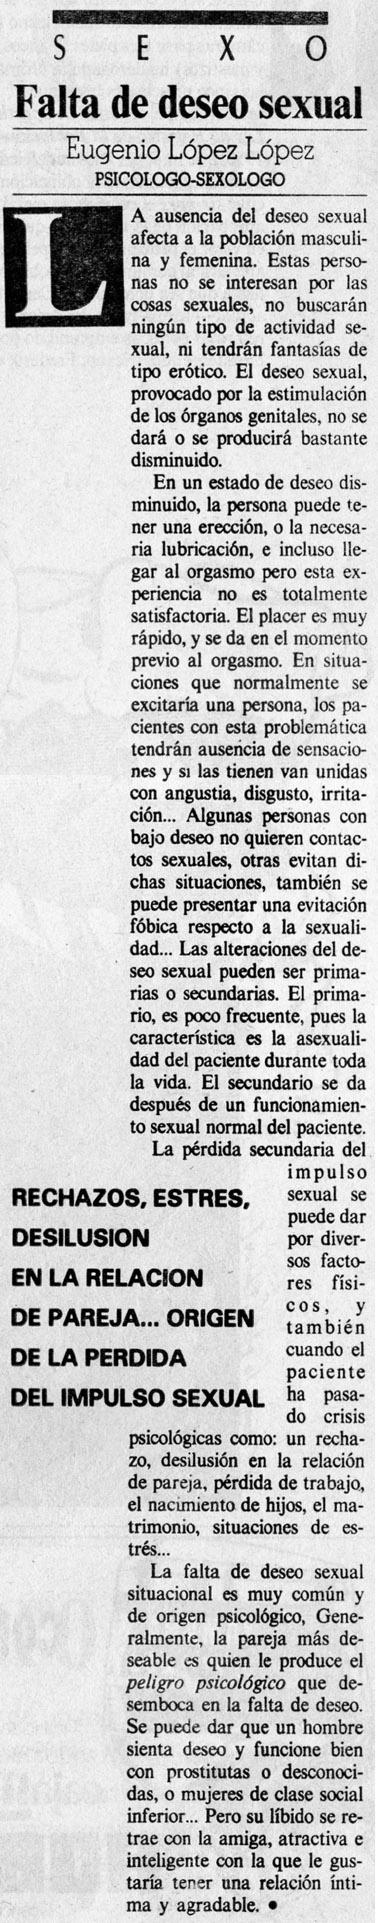 1991-06-23-p